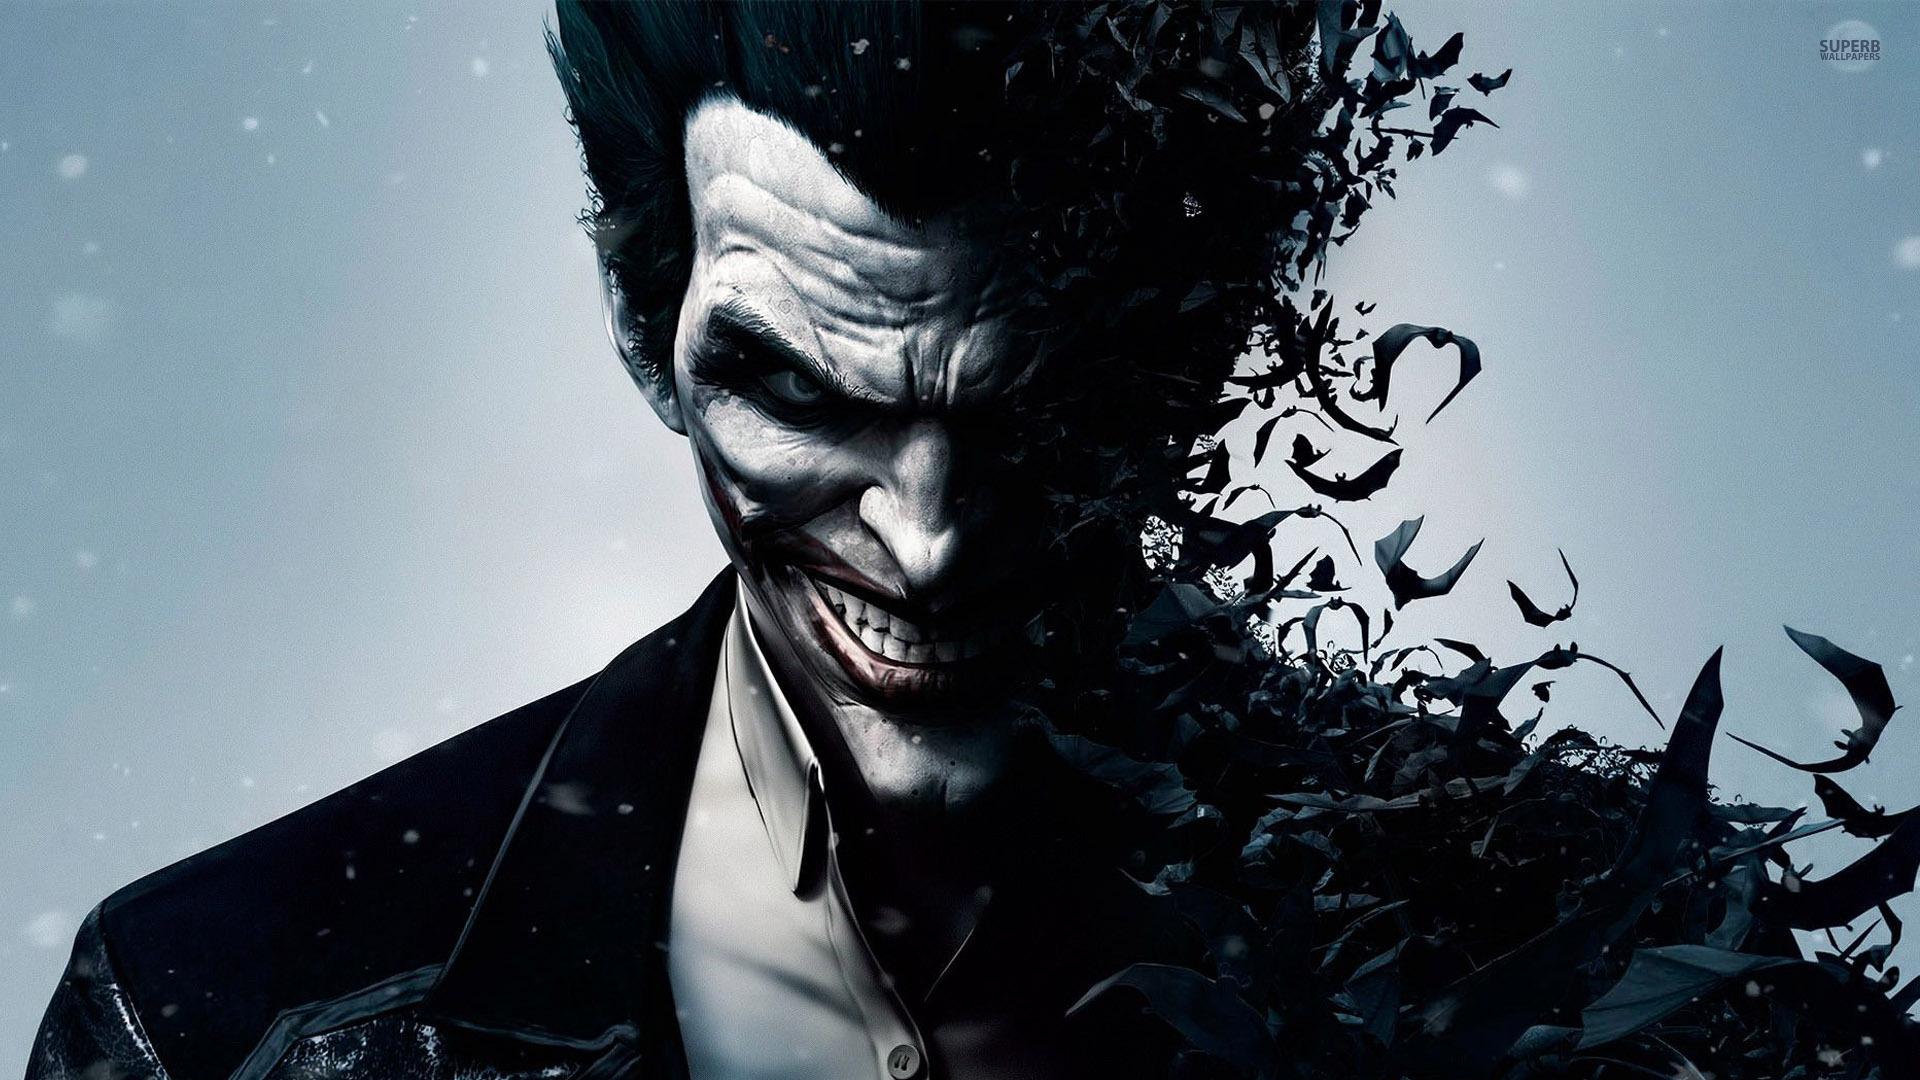 Joker Desktop Backgrounds HD 1920x1080